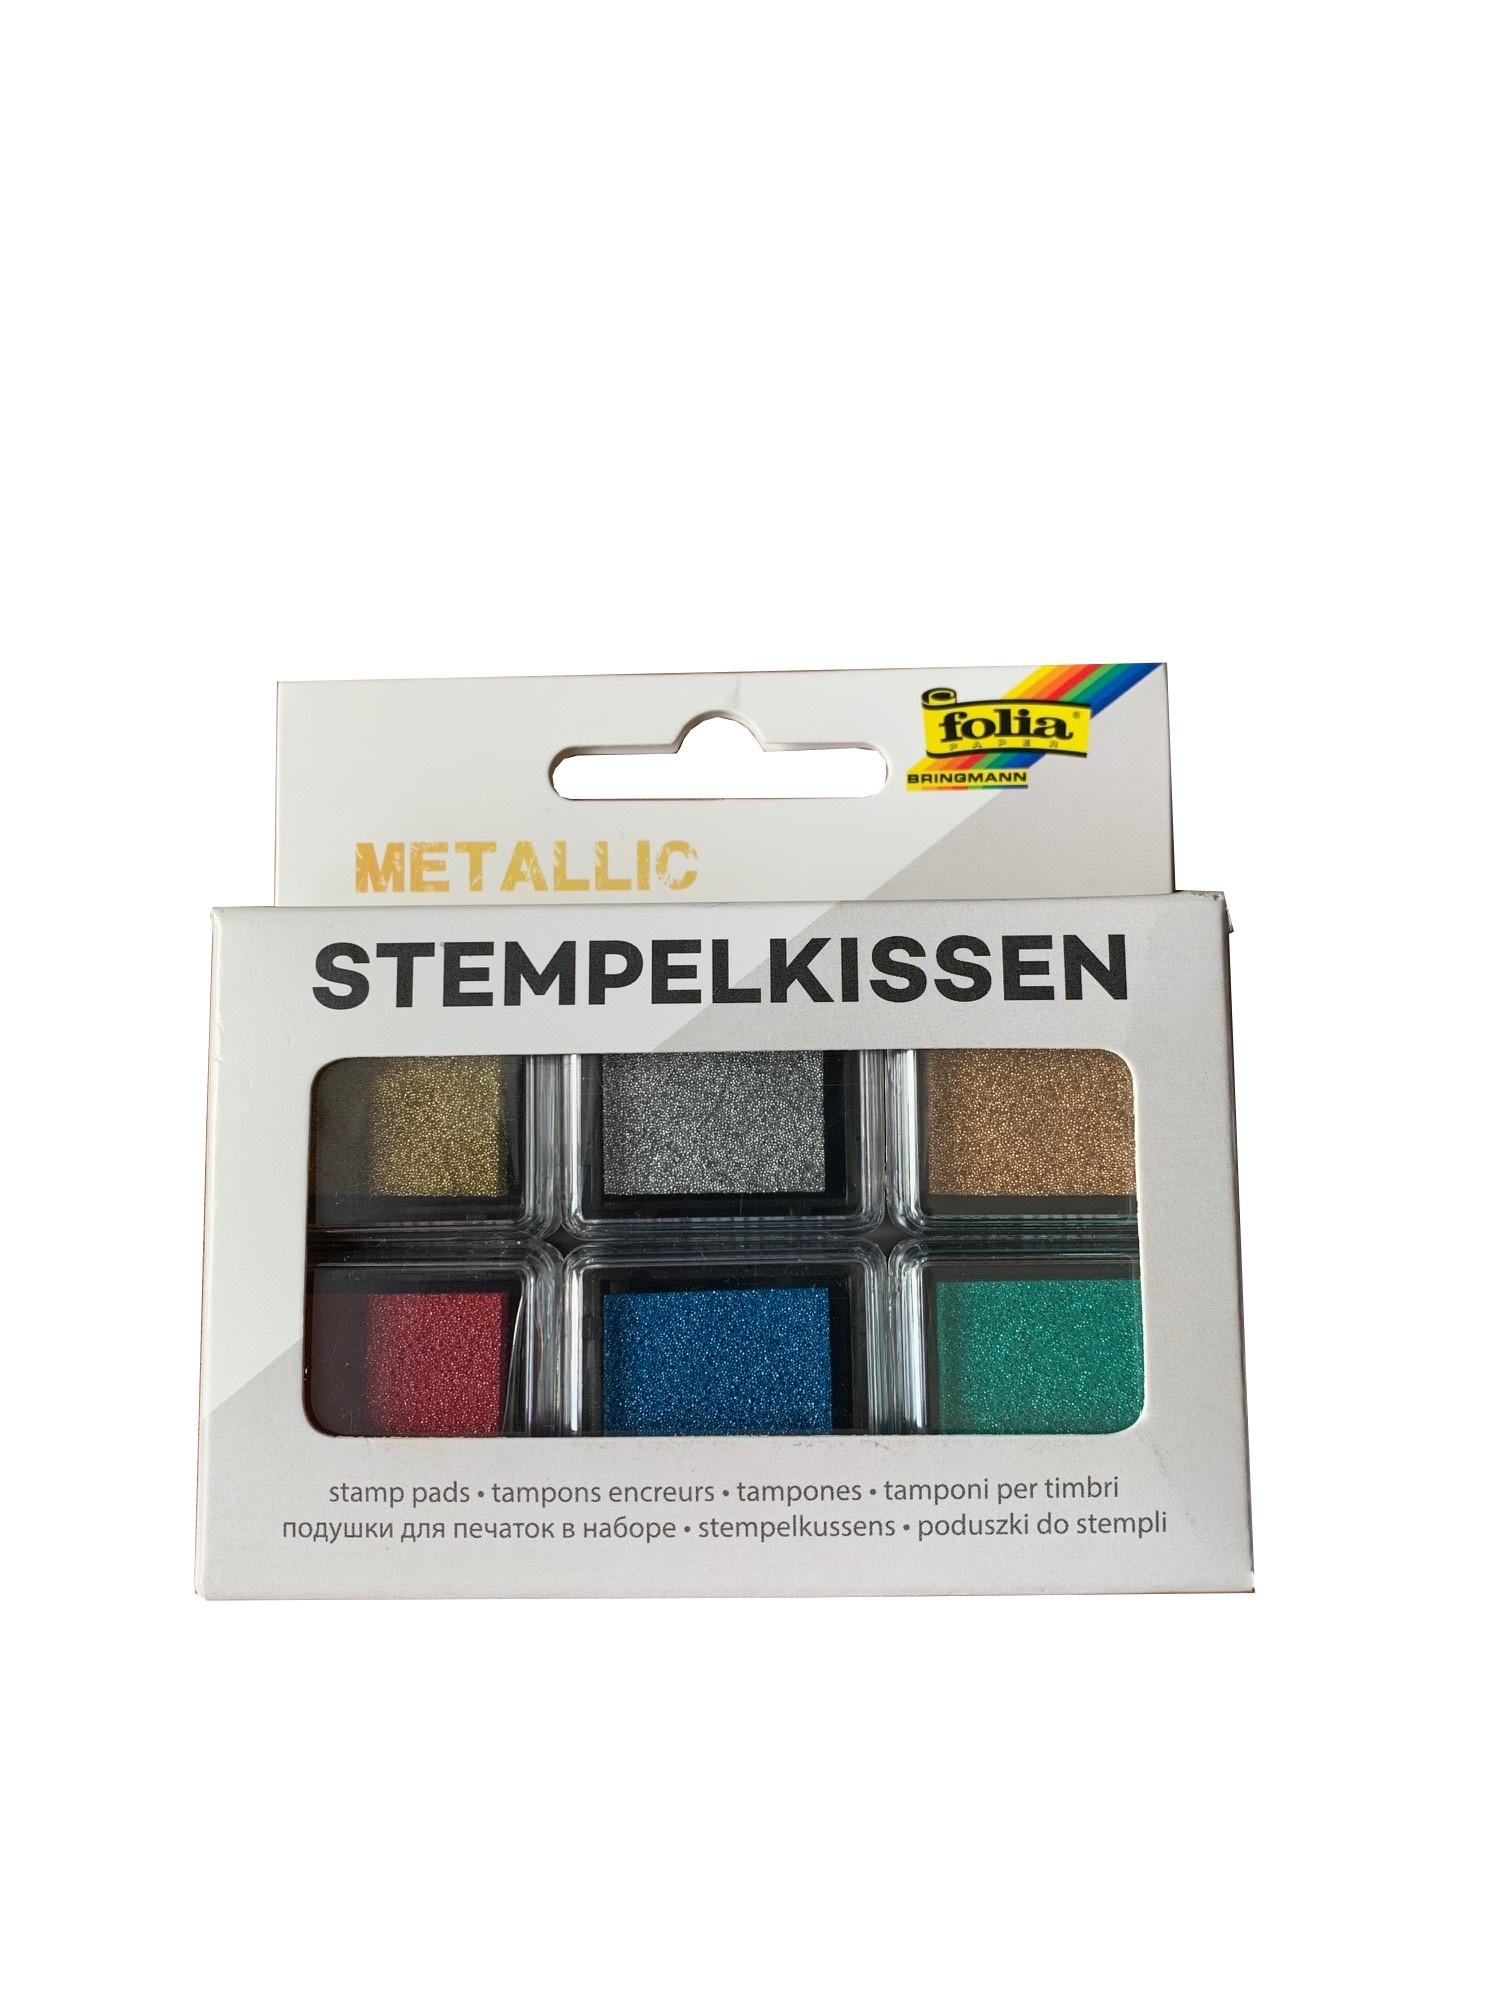 folia 30183 Stempelkissen Set METALLIC, 6 Stück farbig sortiert